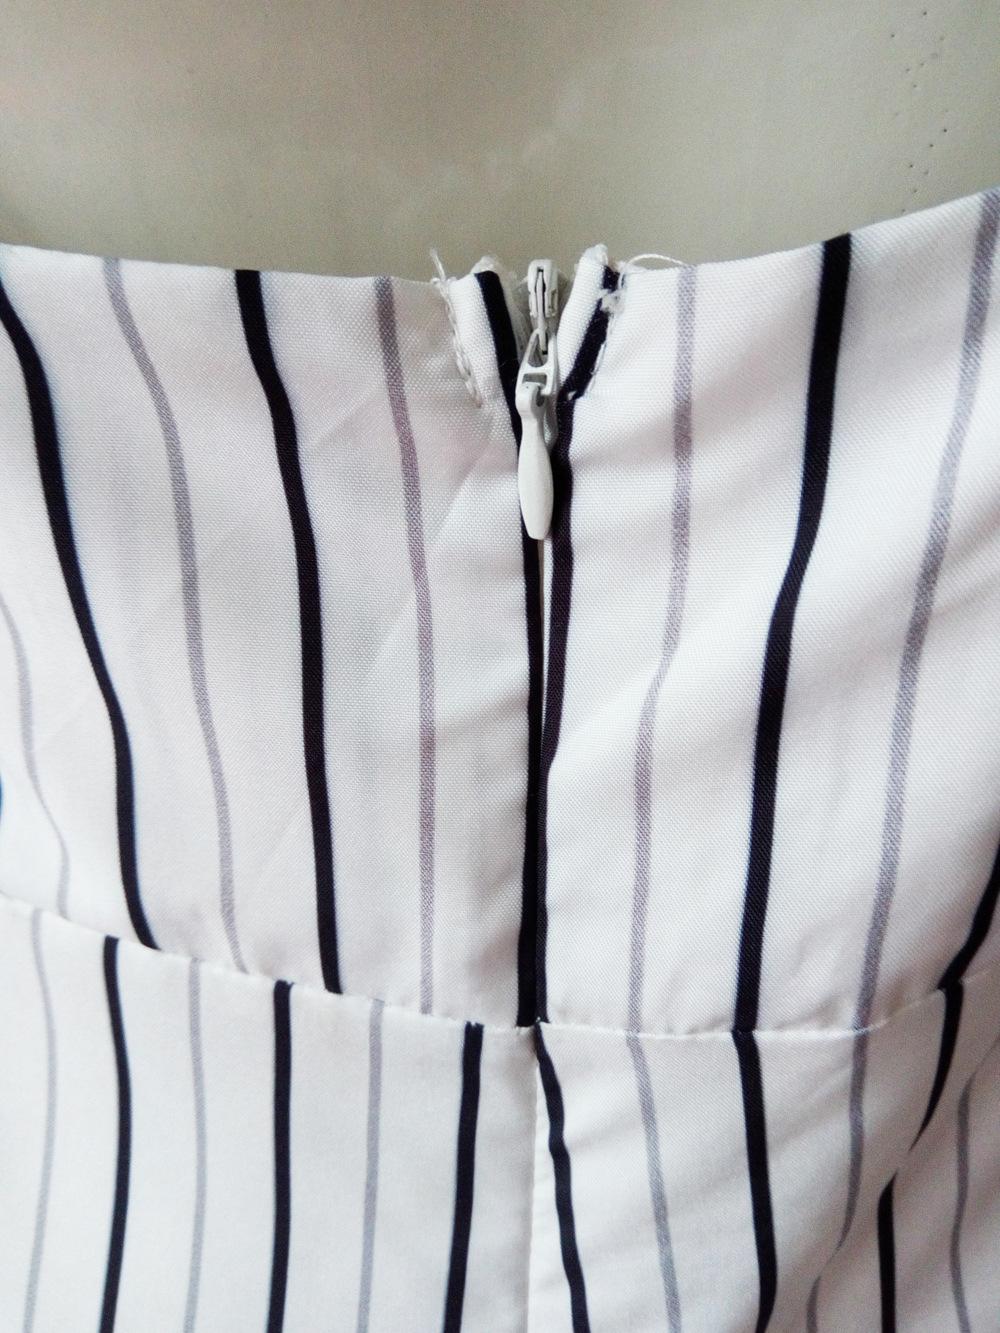 HTB1 sJSSXXXXXbaXVXXq6xXFXXX7 - FREE SHIPPING Women V-Neck Backless Strapless Striped Romper Playsuit Bodycon Club Jumpsuit Tops Outfits Sunsuit JKP377